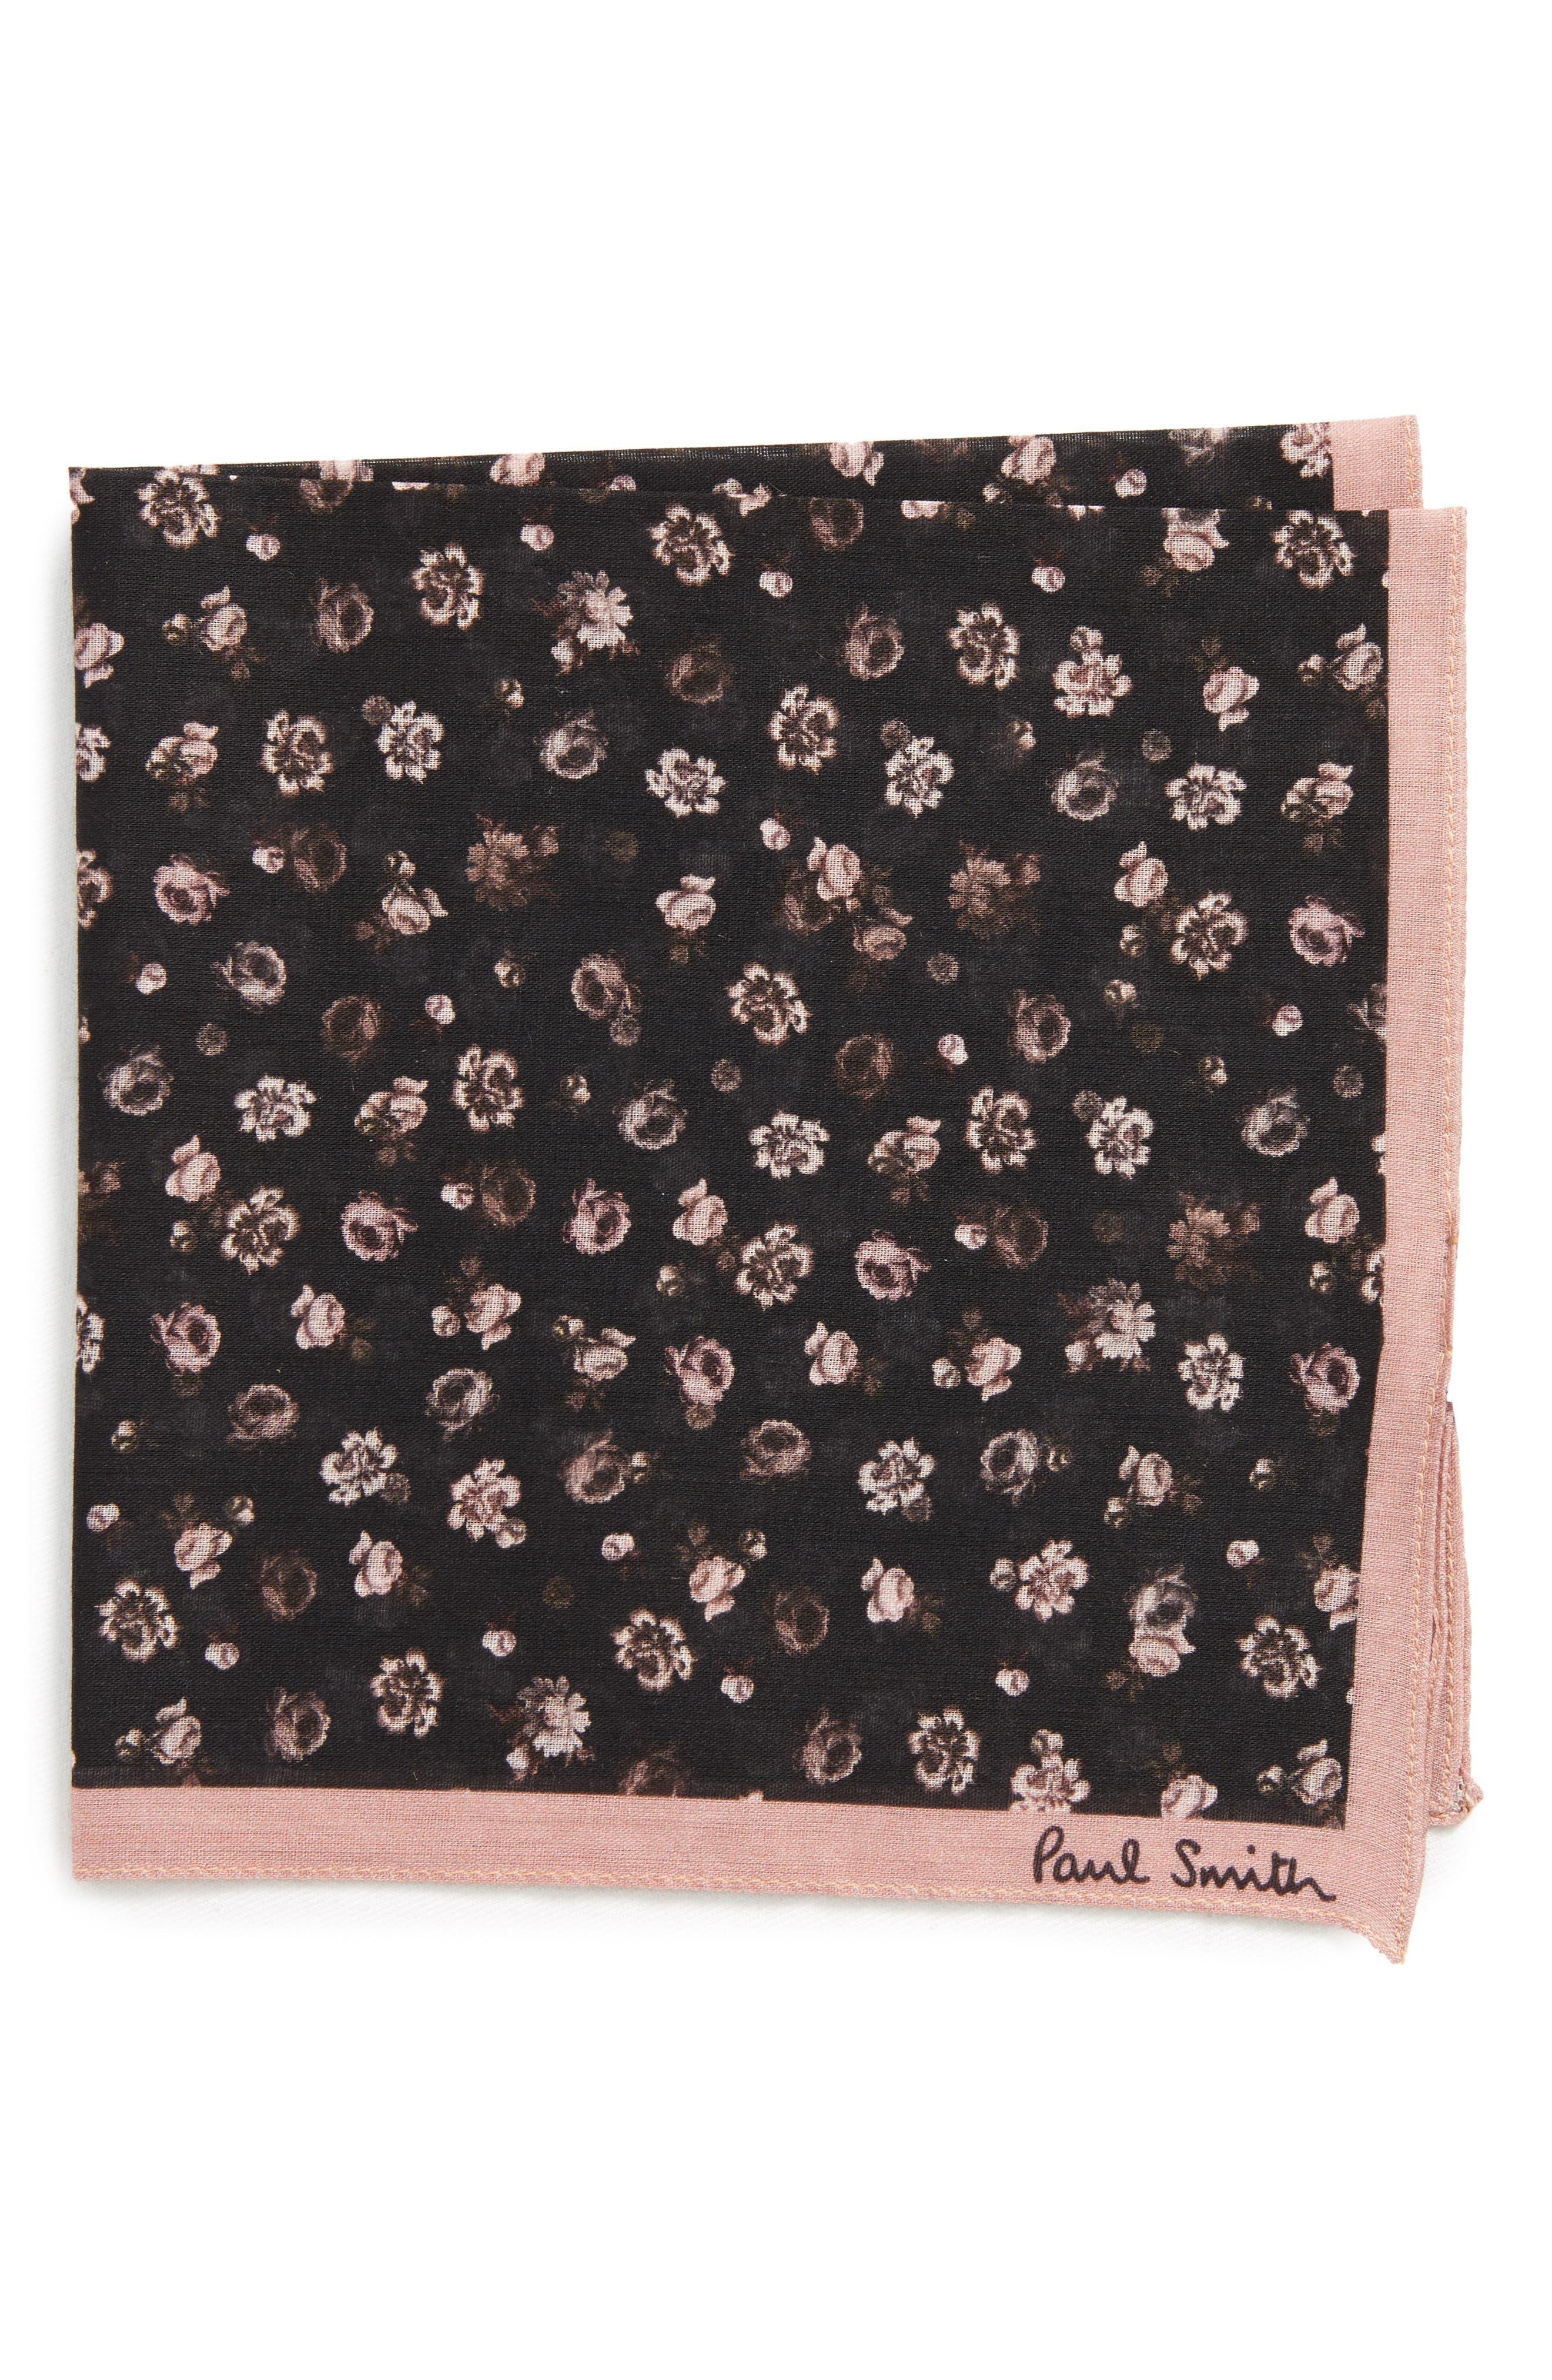 Paul Smith Floral Cotton Pocket Square